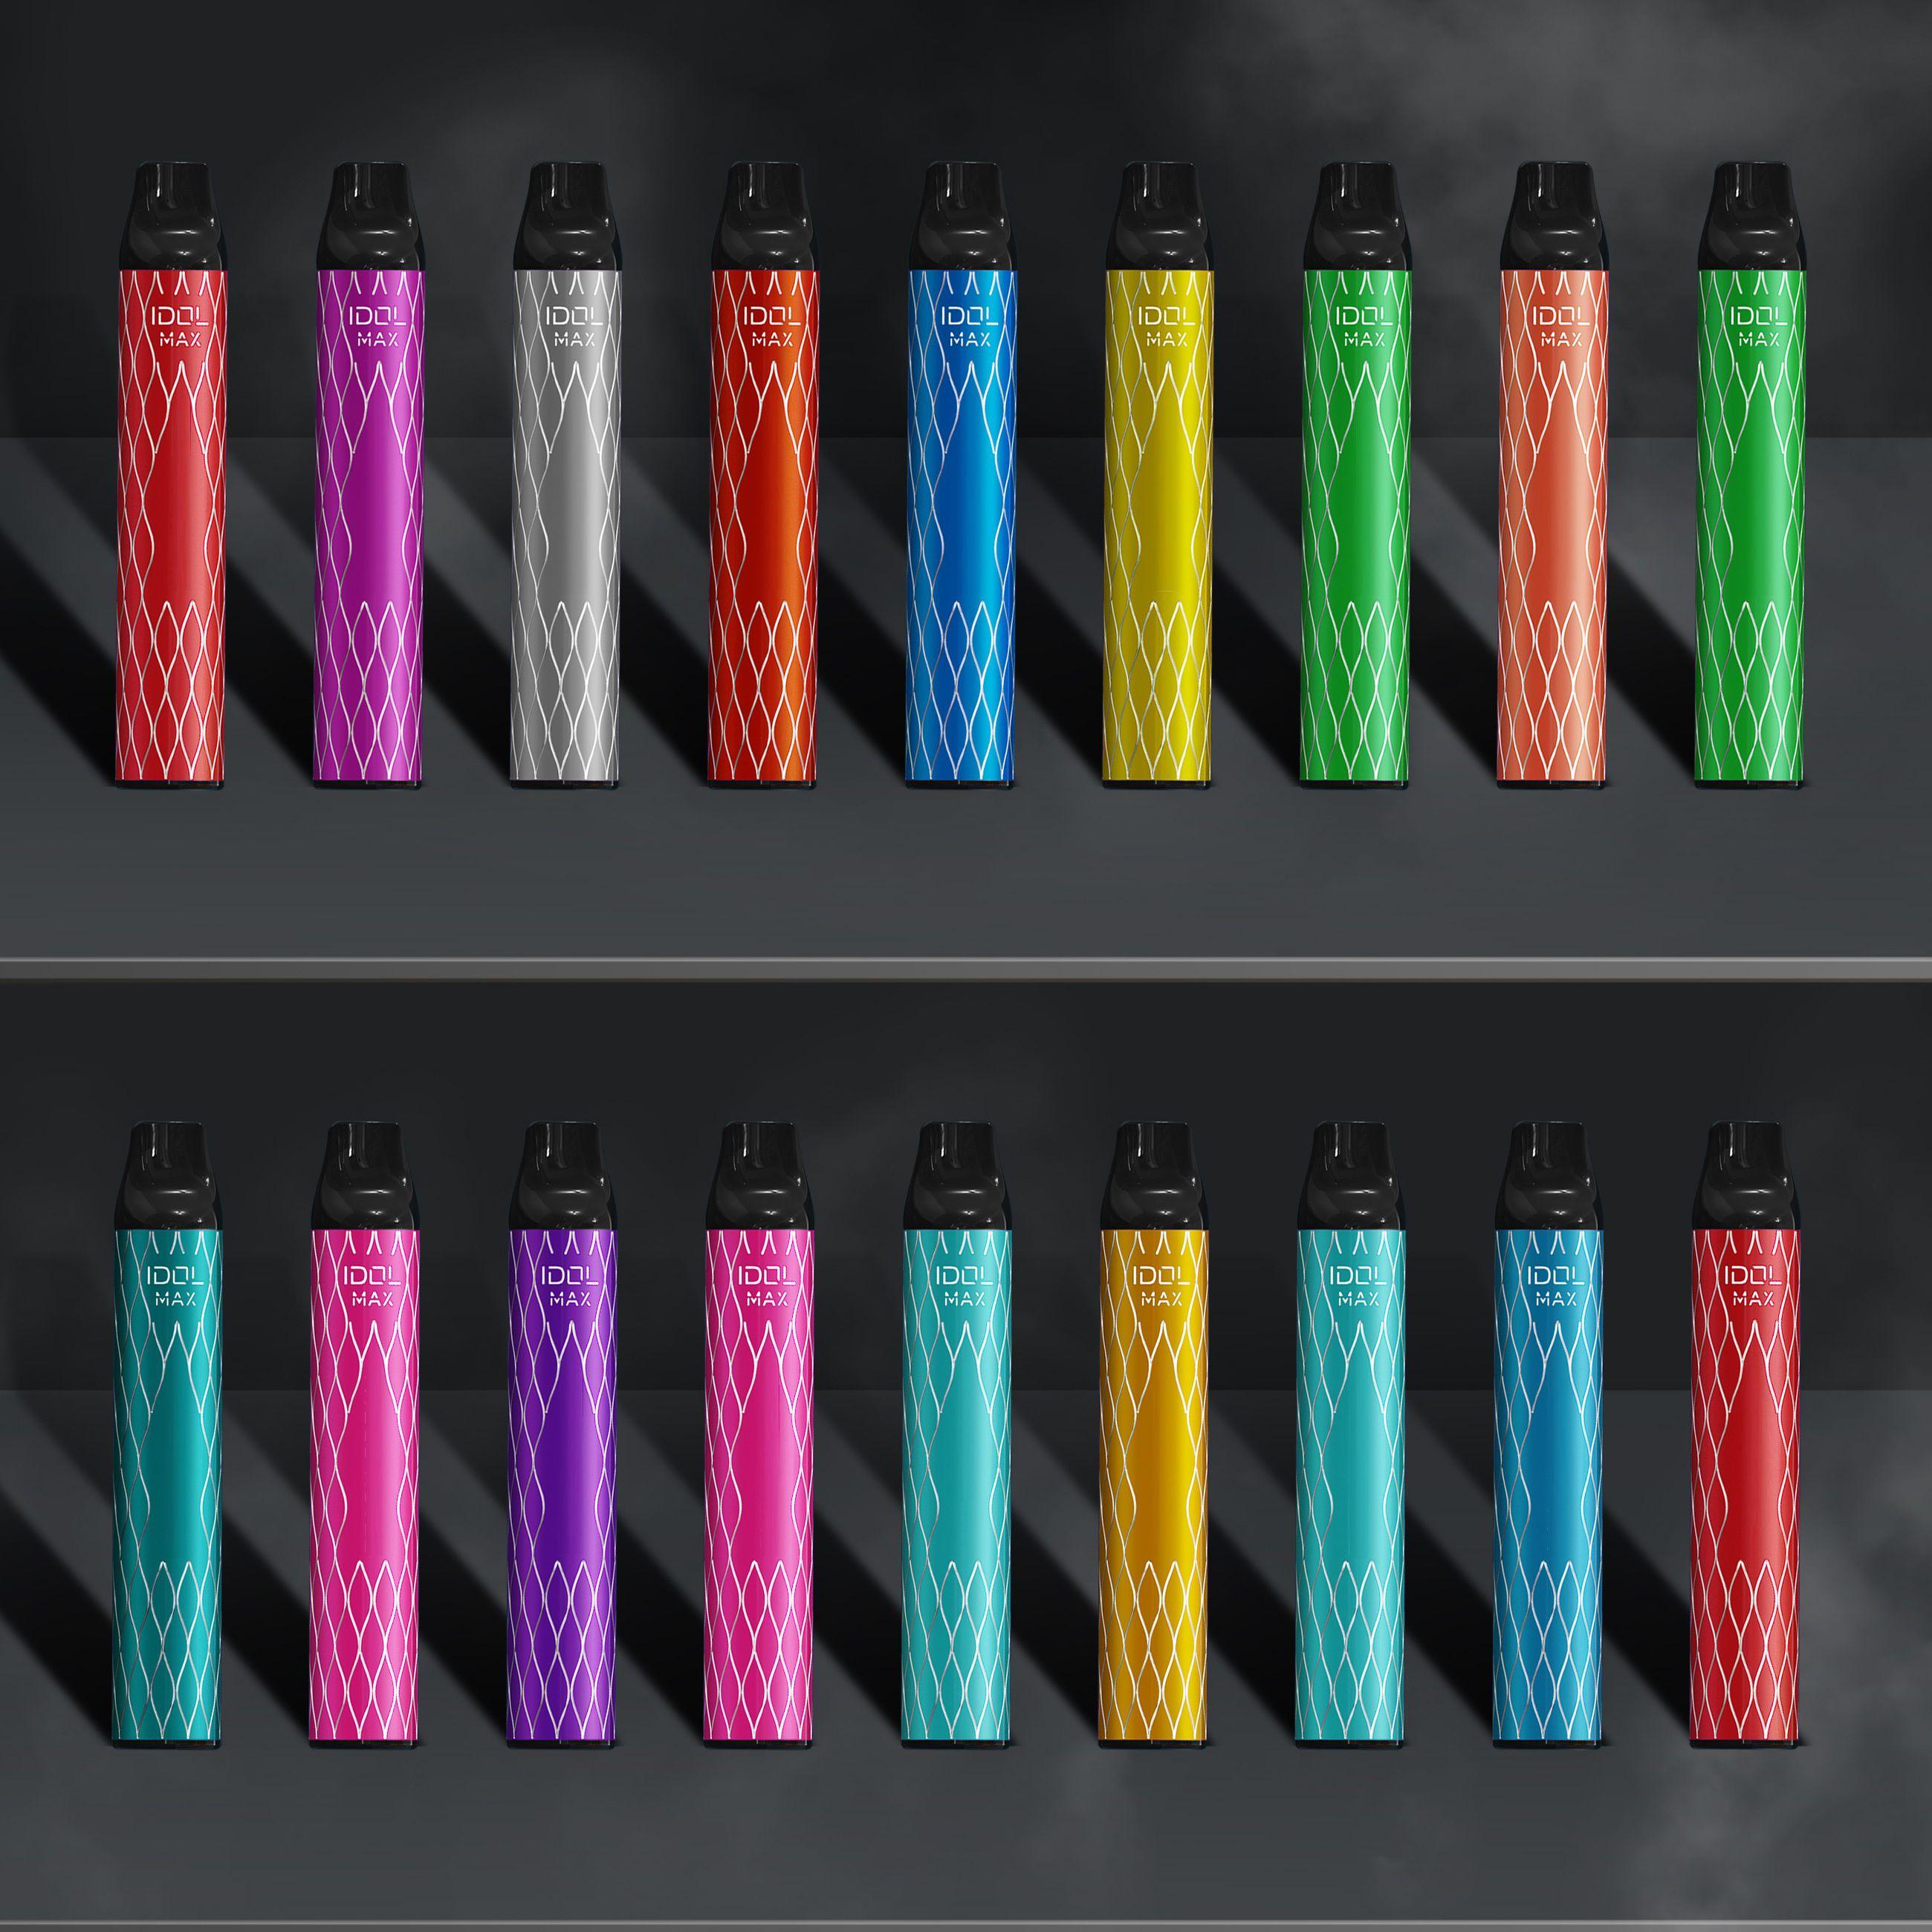 Original Hzko Idol Max 일회용 포드 장치 키트 1100mAh 배터리 2000 퍼프 프리 퀼트 6.5ml 포드 카트리지 vape 펜 전자 담배 플러스 바 100 % 정통